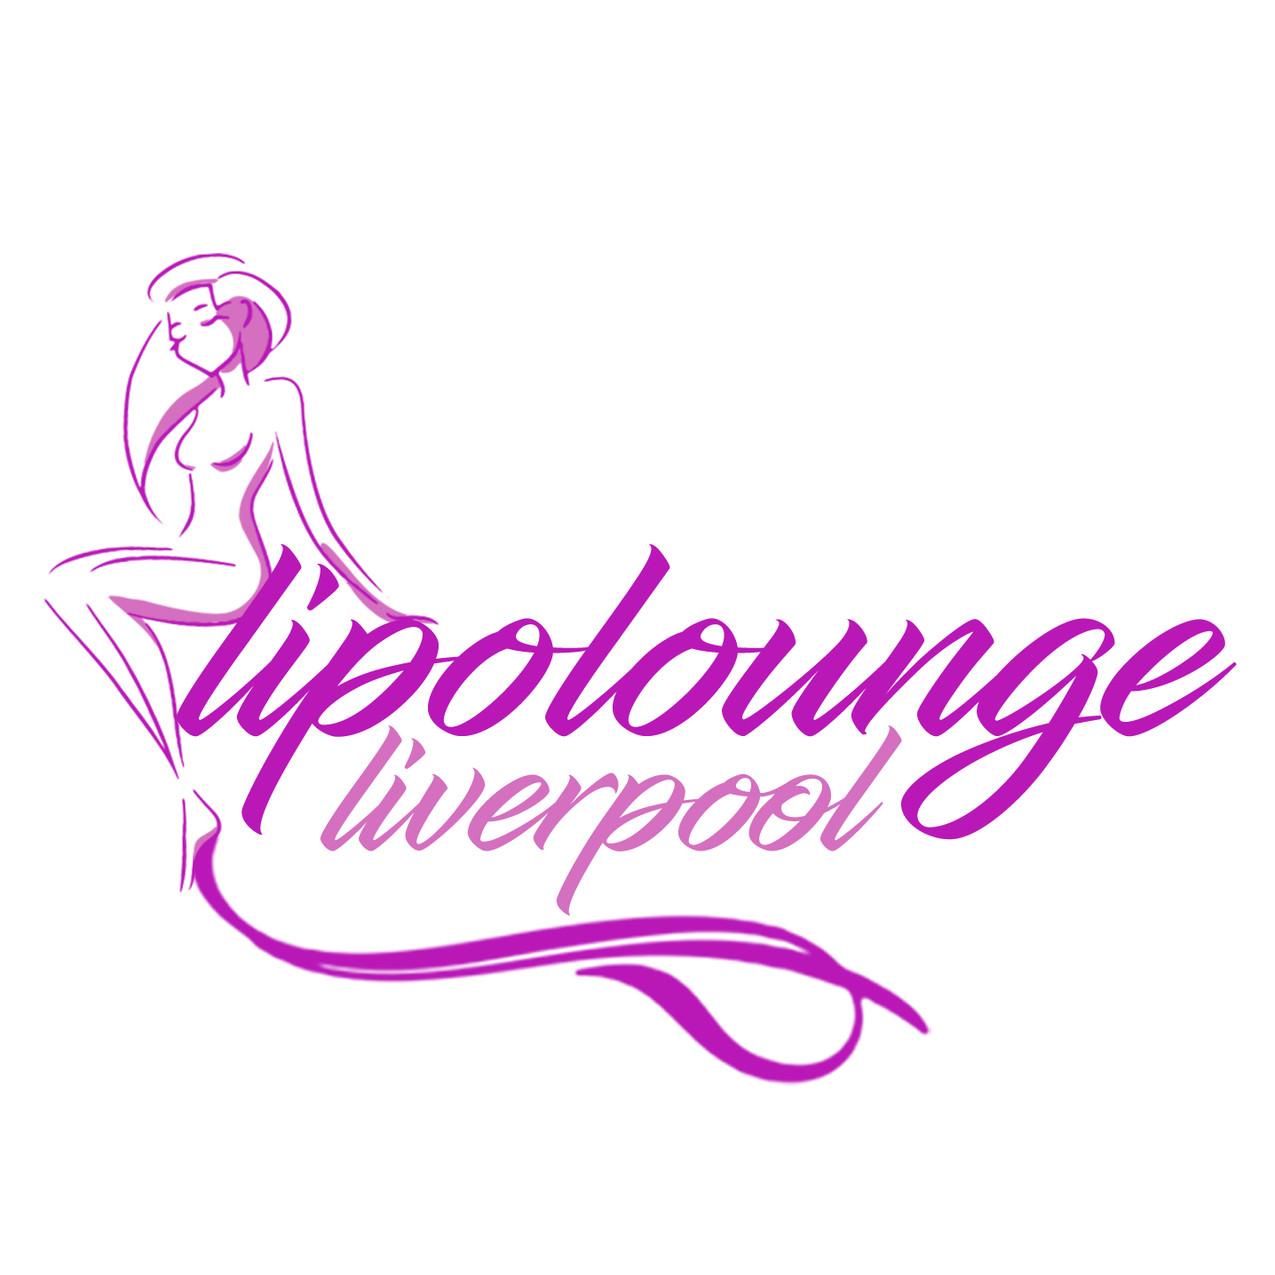 Lipolounge Liverpool